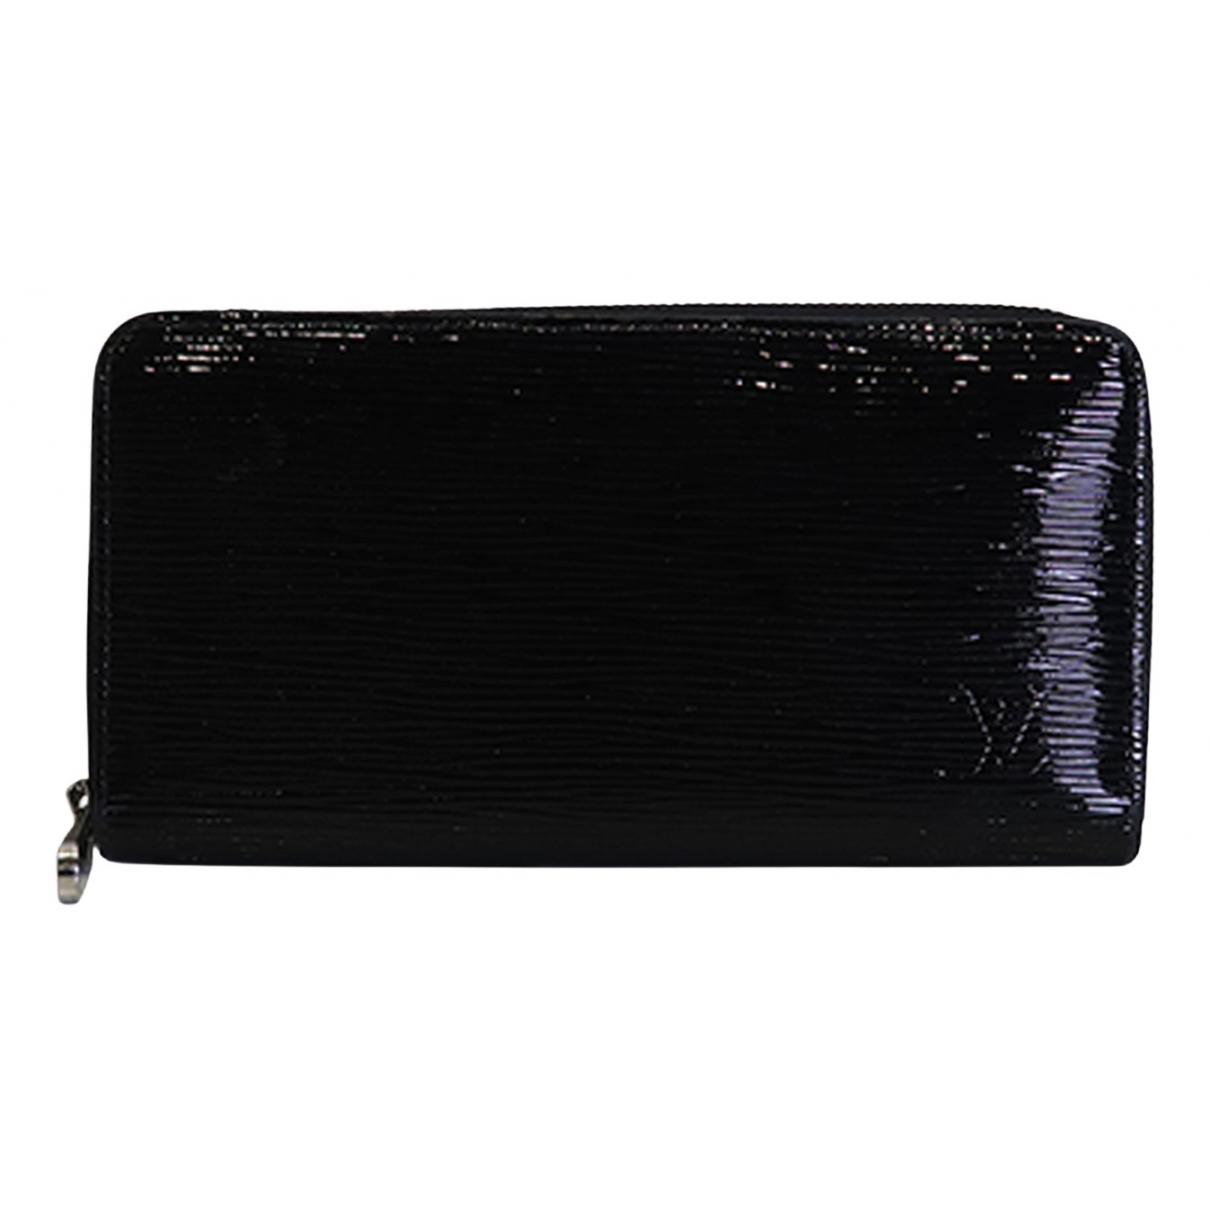 Louis Vuitton Zippy Black Patent leather wallet for Women N